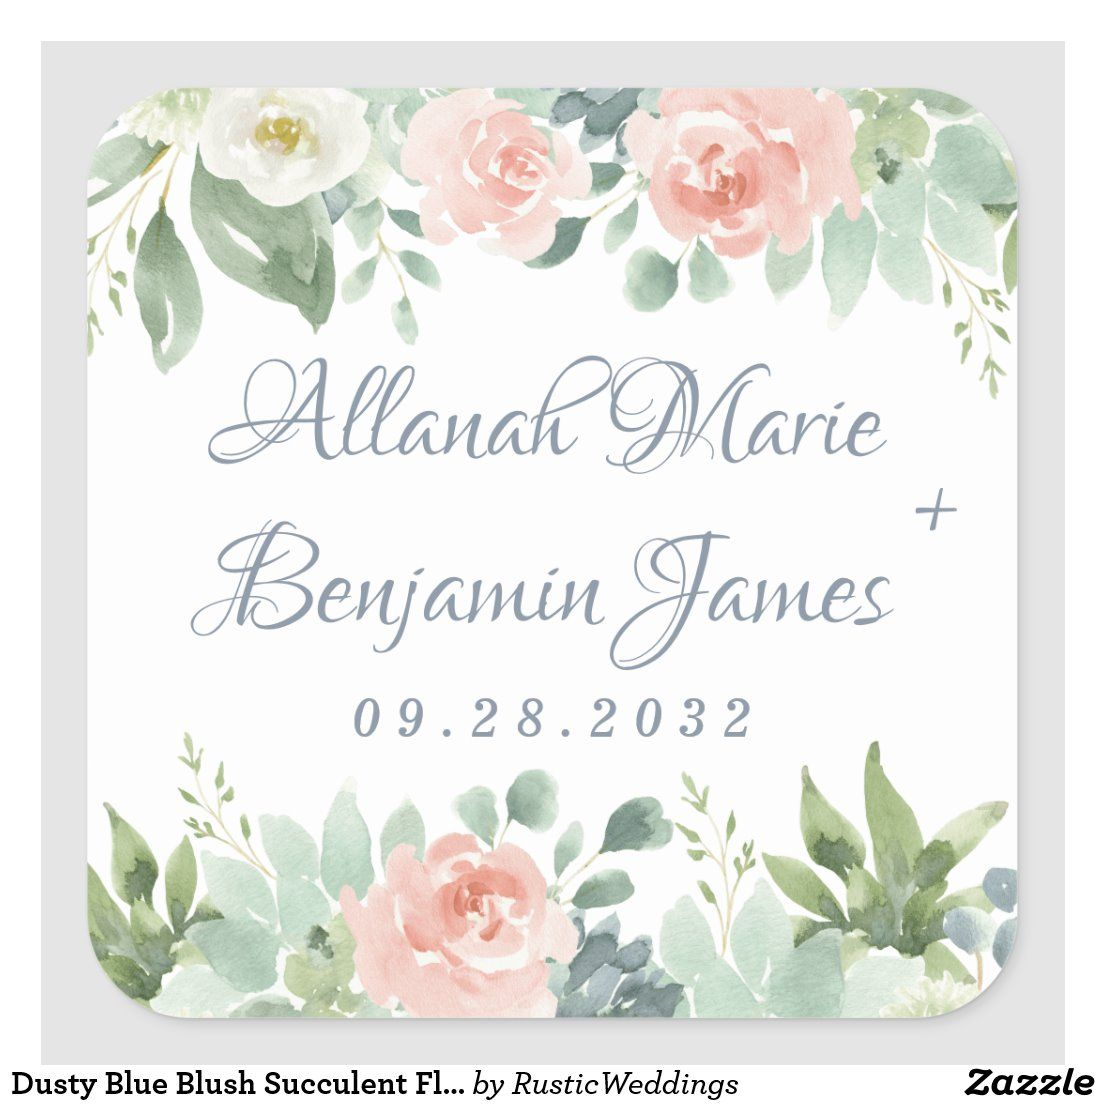 Personalized Address Labels  Blue White Anemone Flowers  Custom Labels  Envelope Seals  Spring Floral  Favor Labels  Thank You Labels